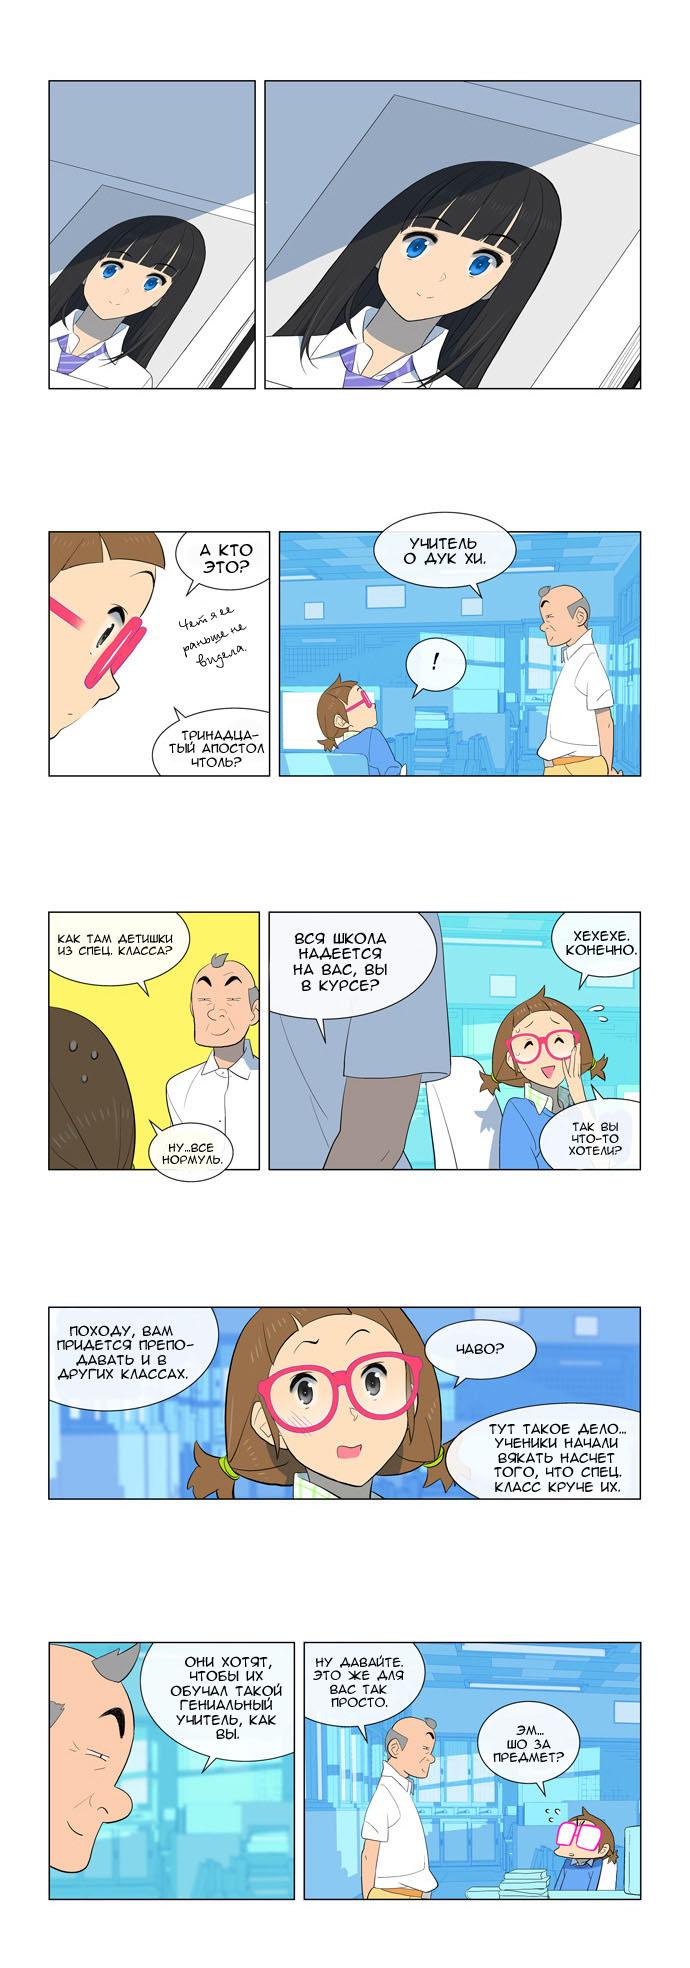 https://r1.ninemanga.com/comics/pic2/32/21344/207404/1427847980679.jpg Page 3